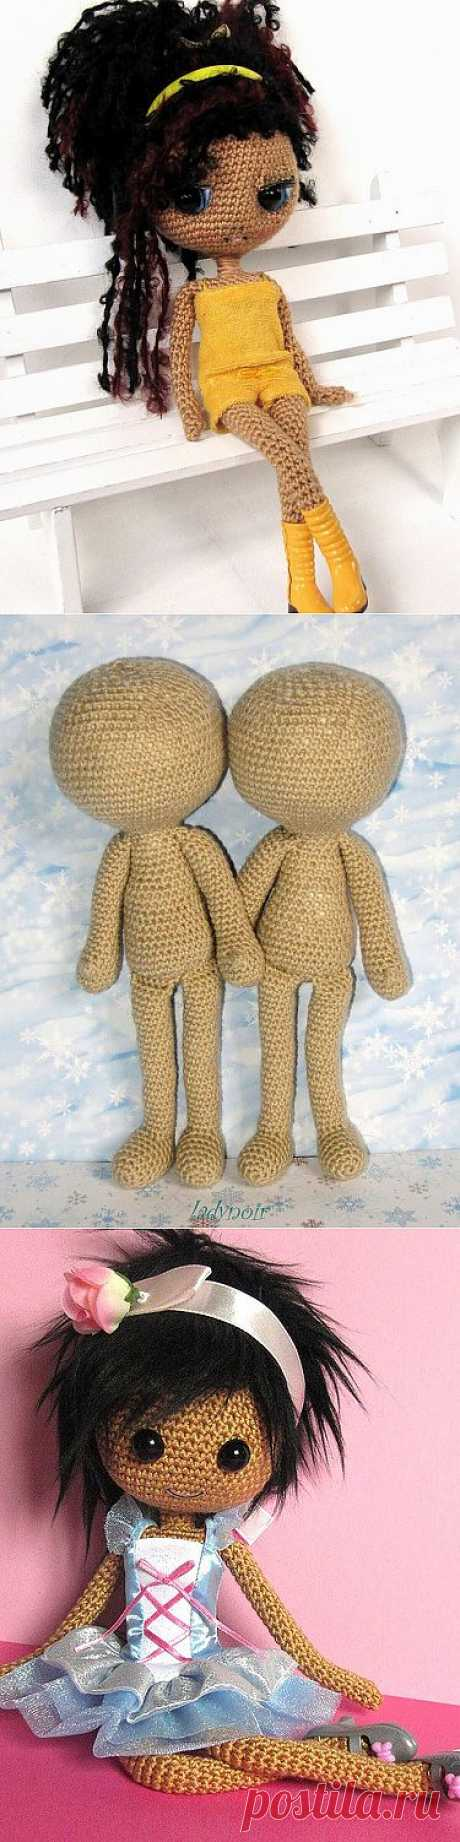 Вязаные куколки амигуруми (образы).